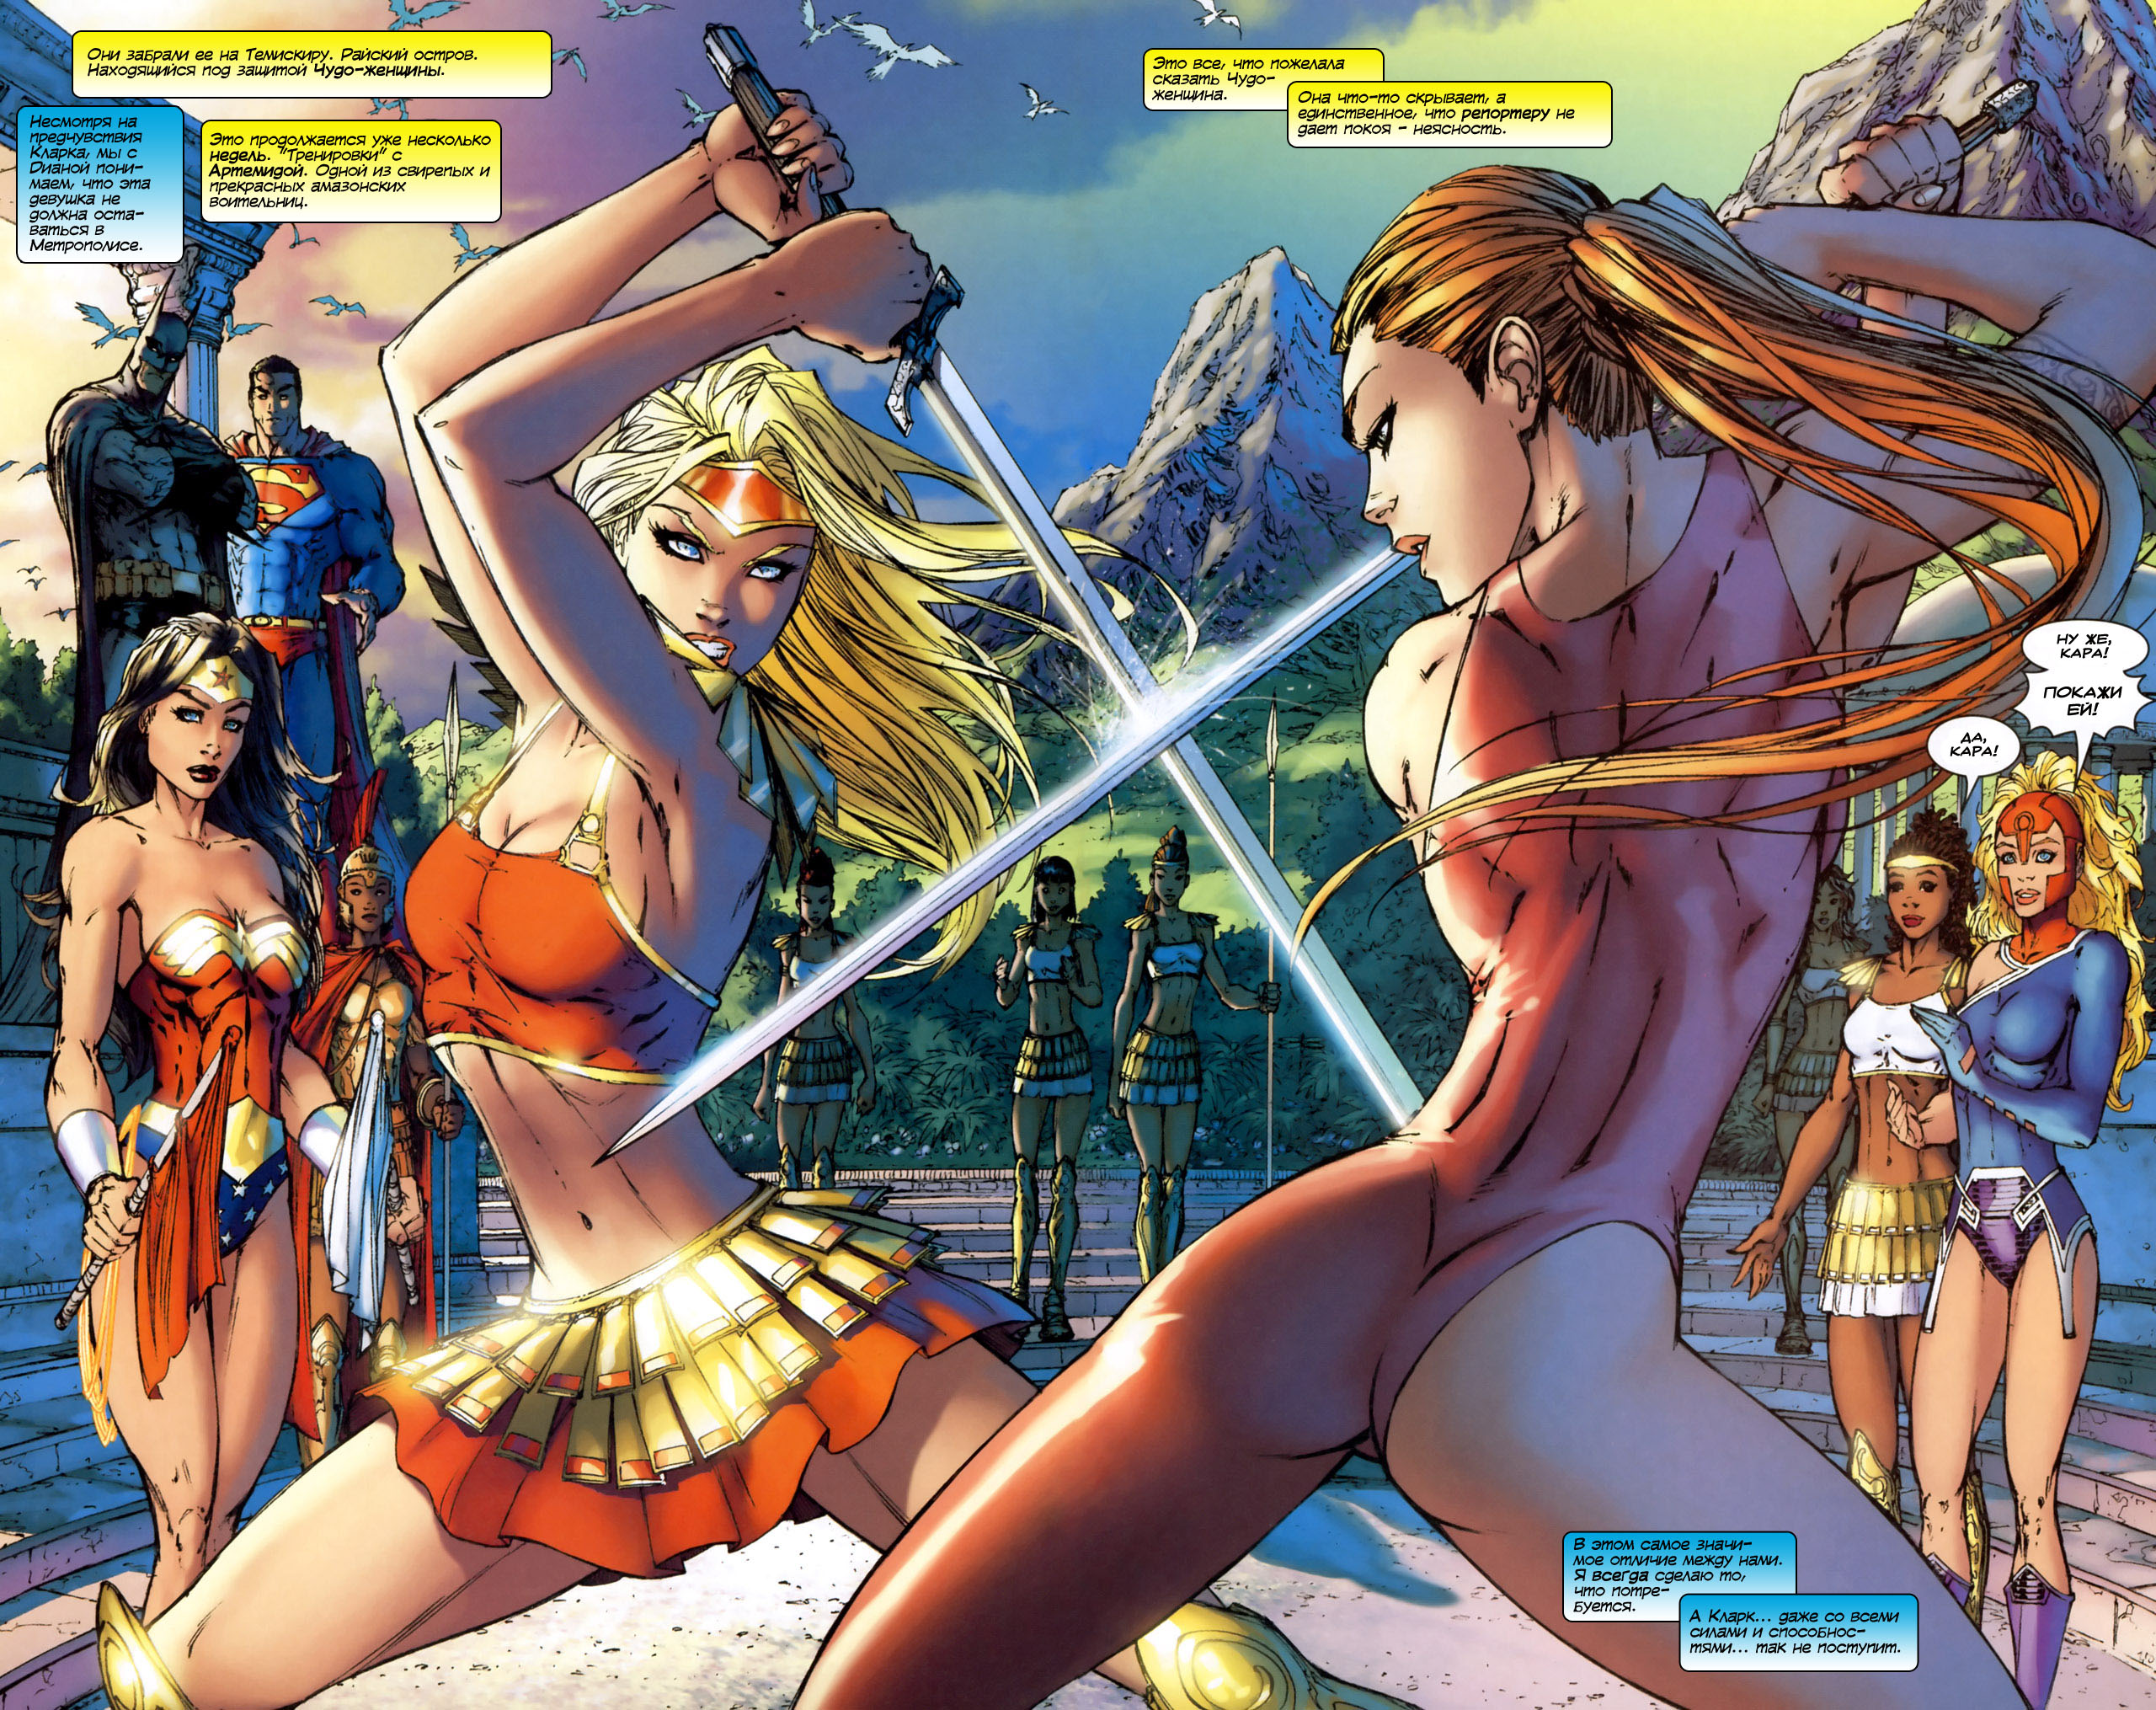 Supergirl artworkporn hentai images